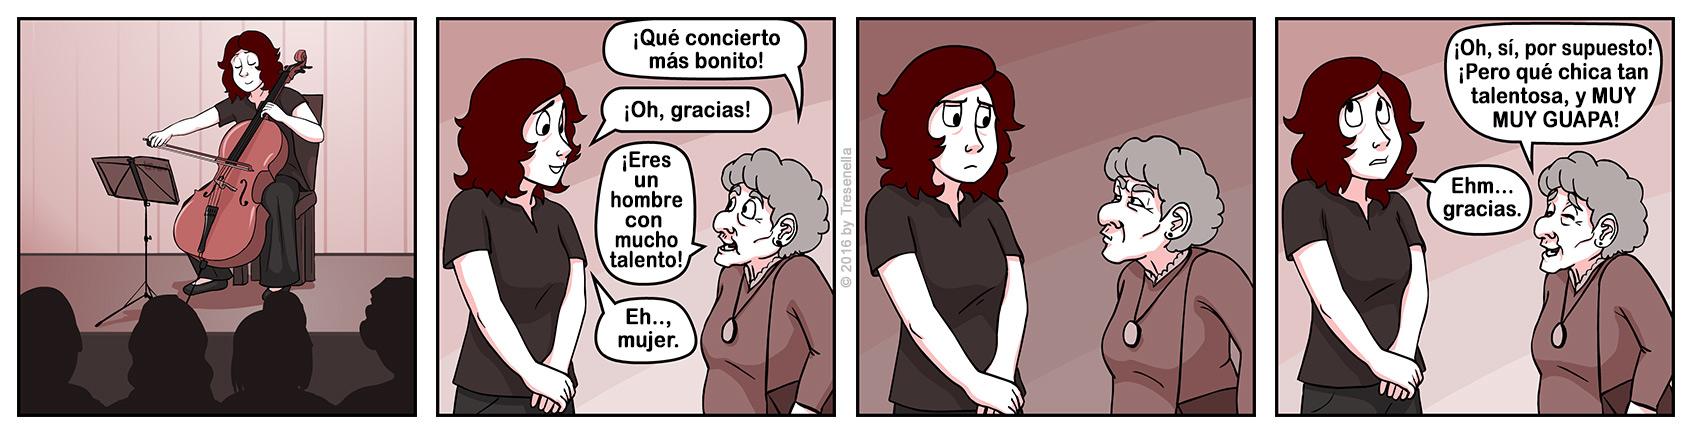 TransLucid - 33 [Spanish] by TransLucidComic